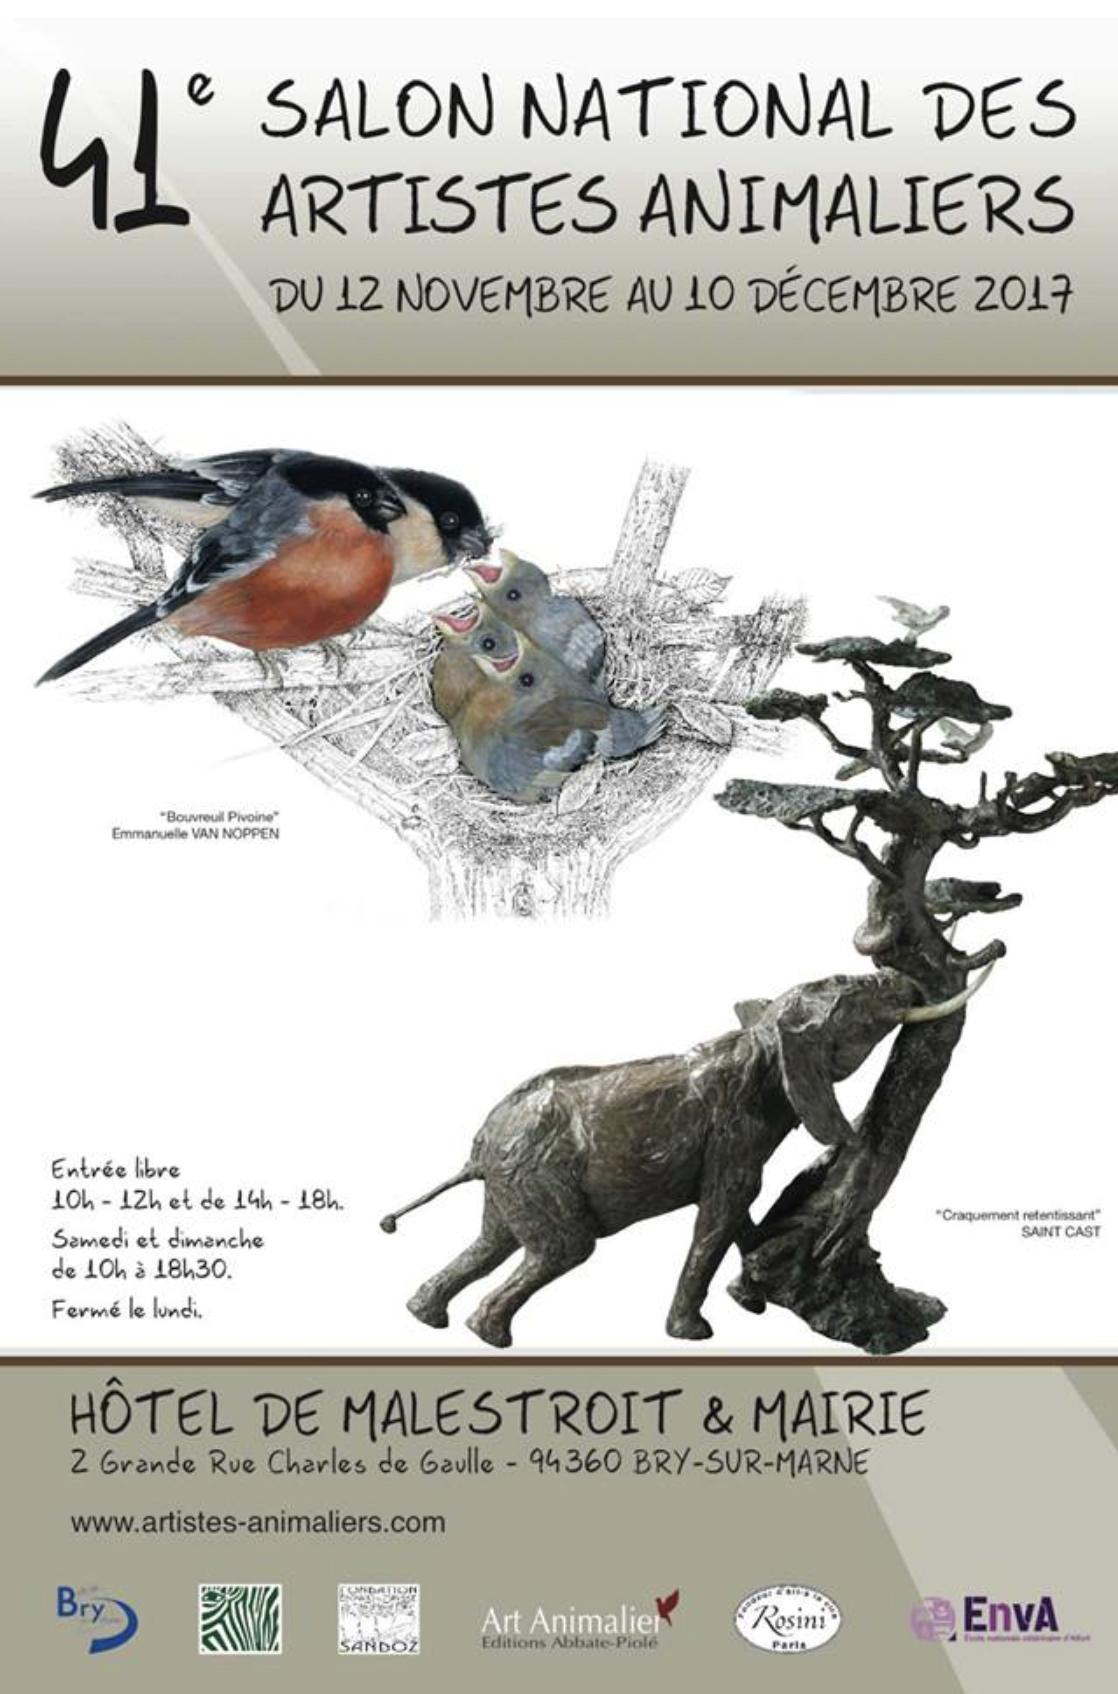 Salon national des artistes animaliers - 41e édition - Bry s/Marne 2017